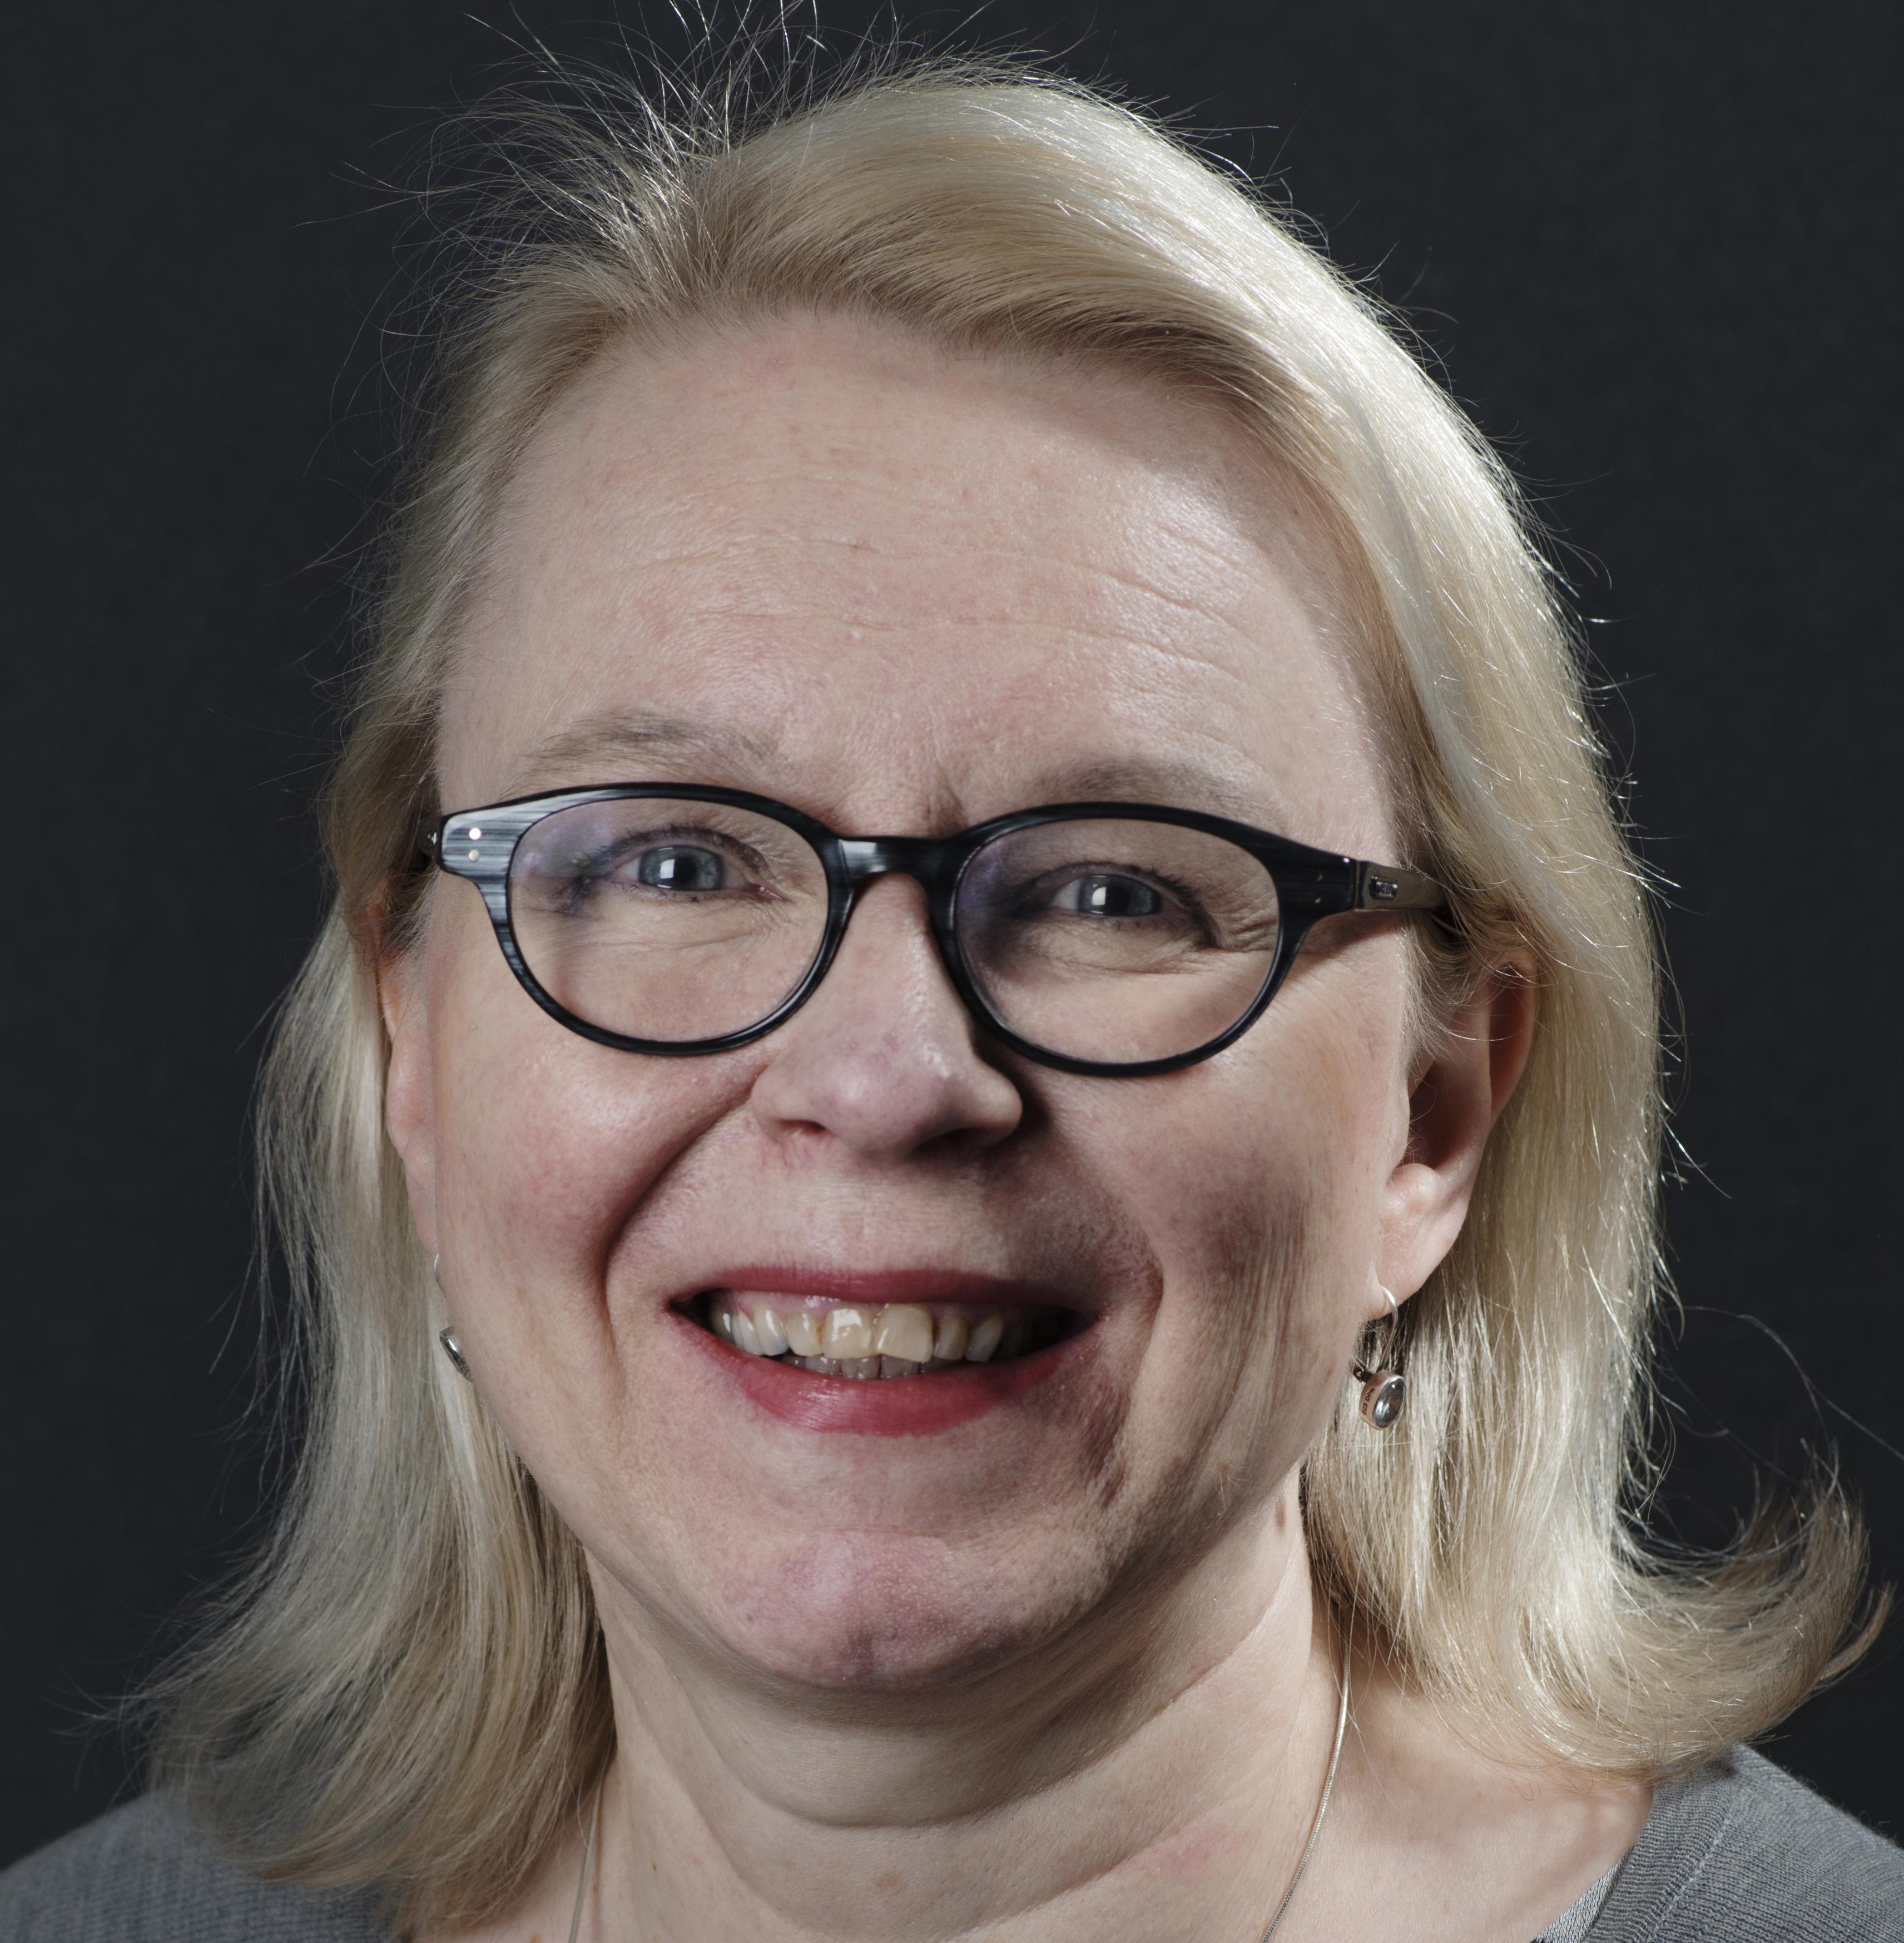 Hannele Laivuori